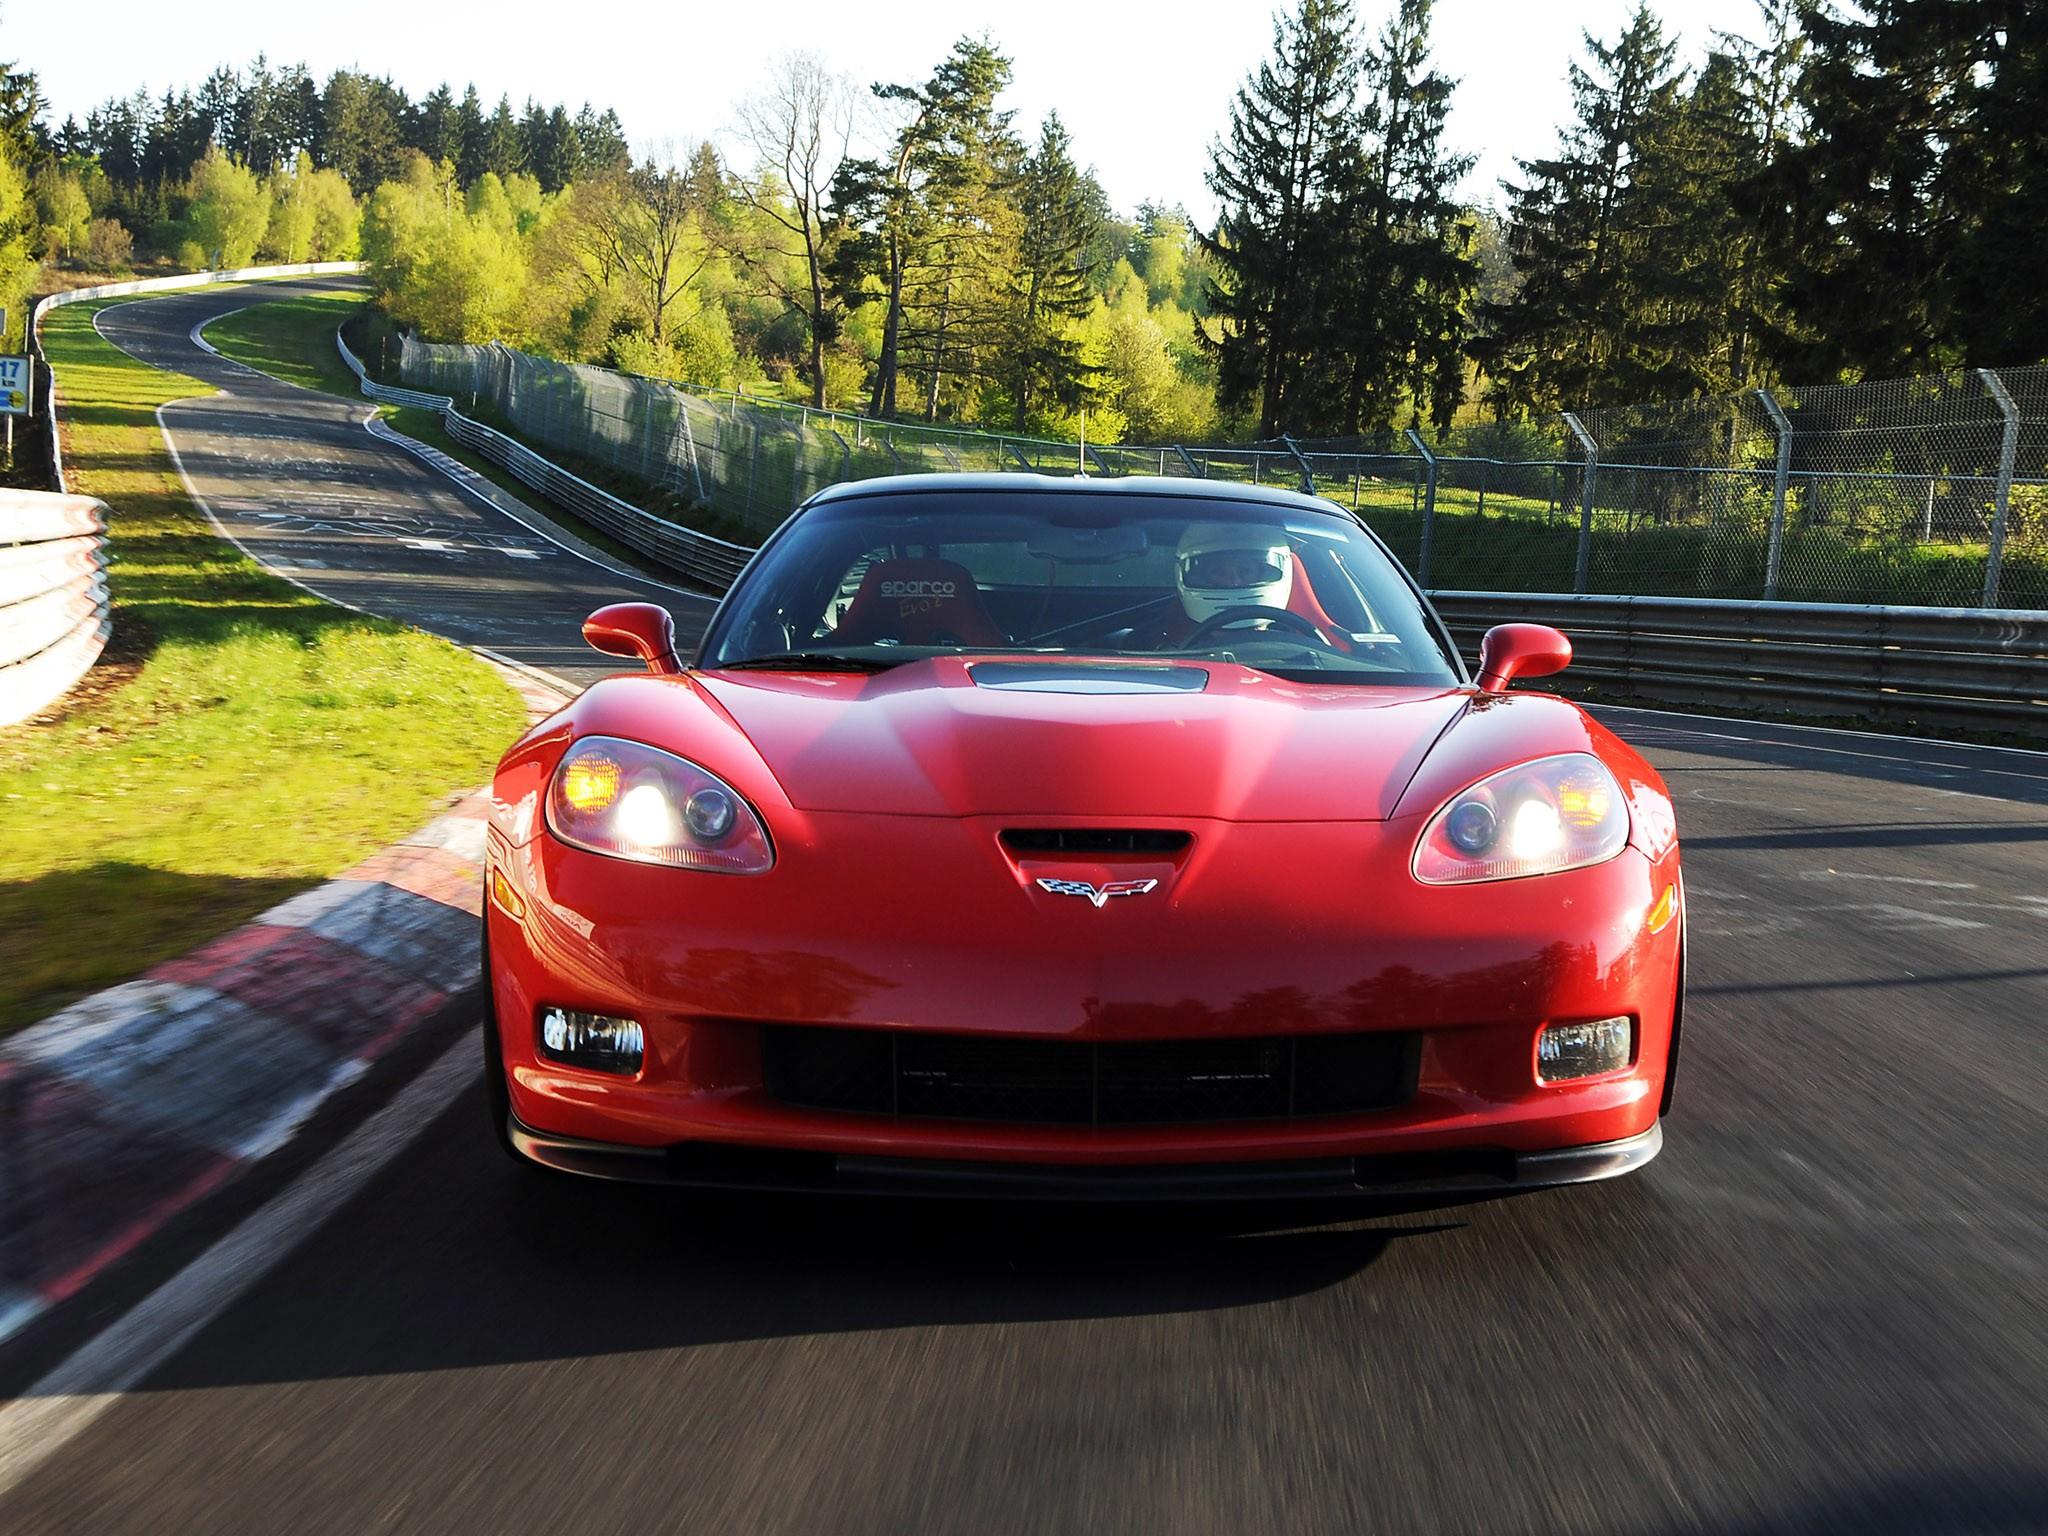 corvette zr1 2008 - photo #13